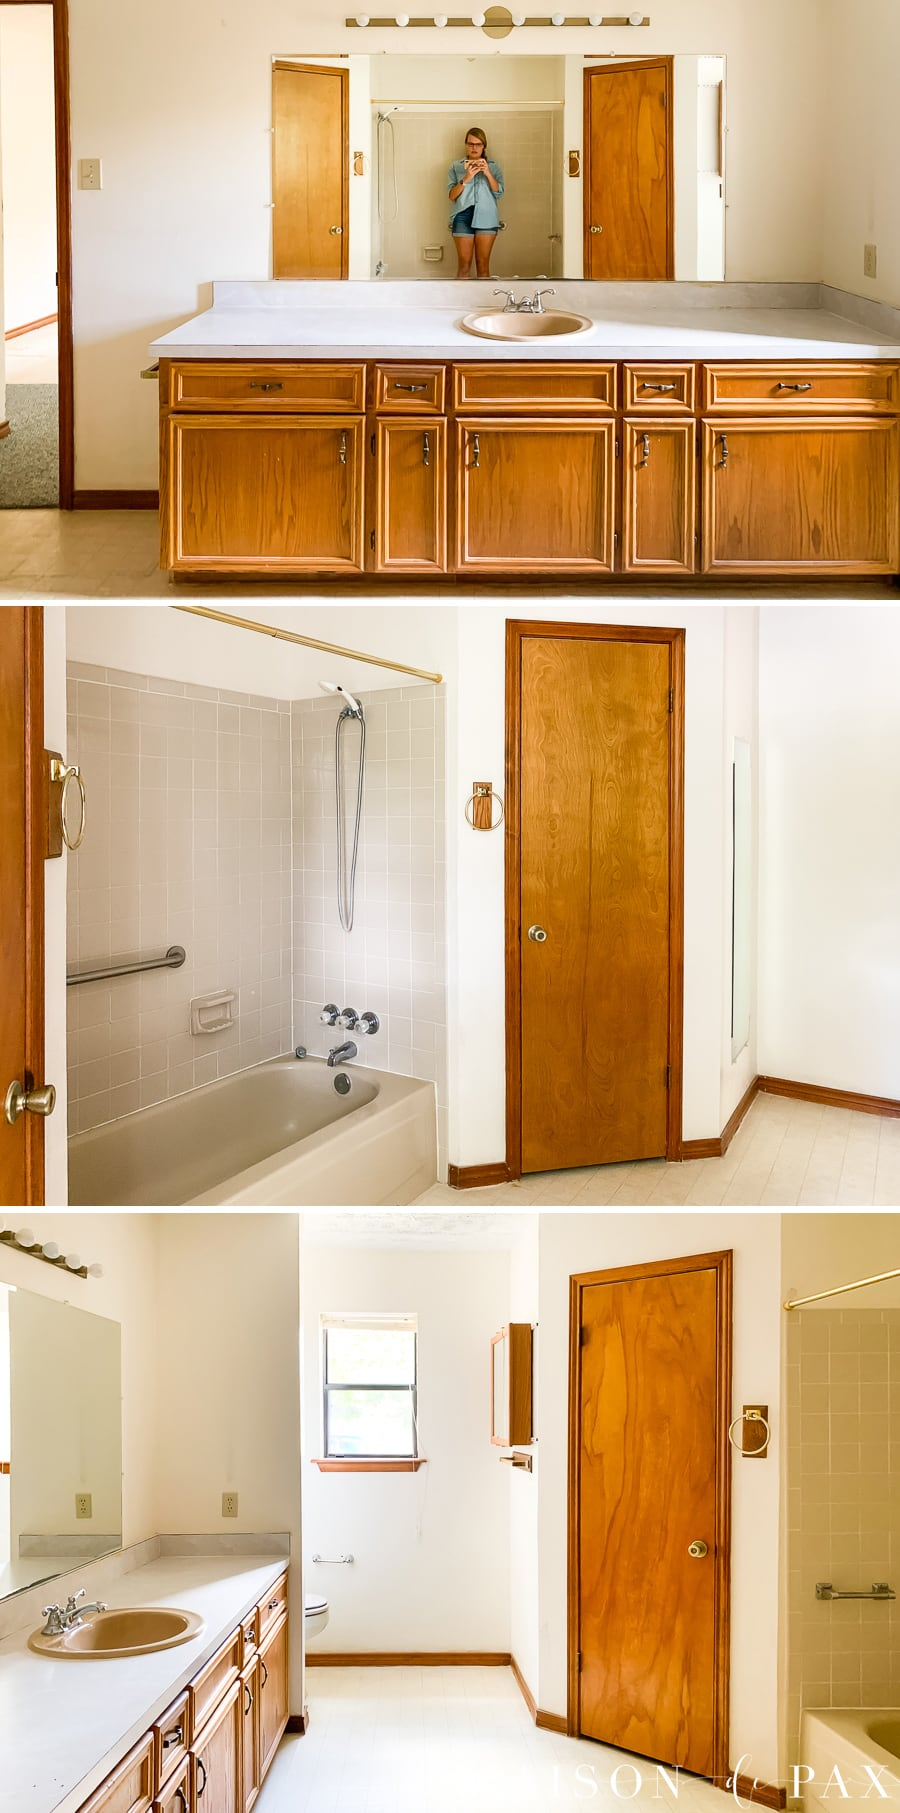 80s bathroom before with orange oak cabinets